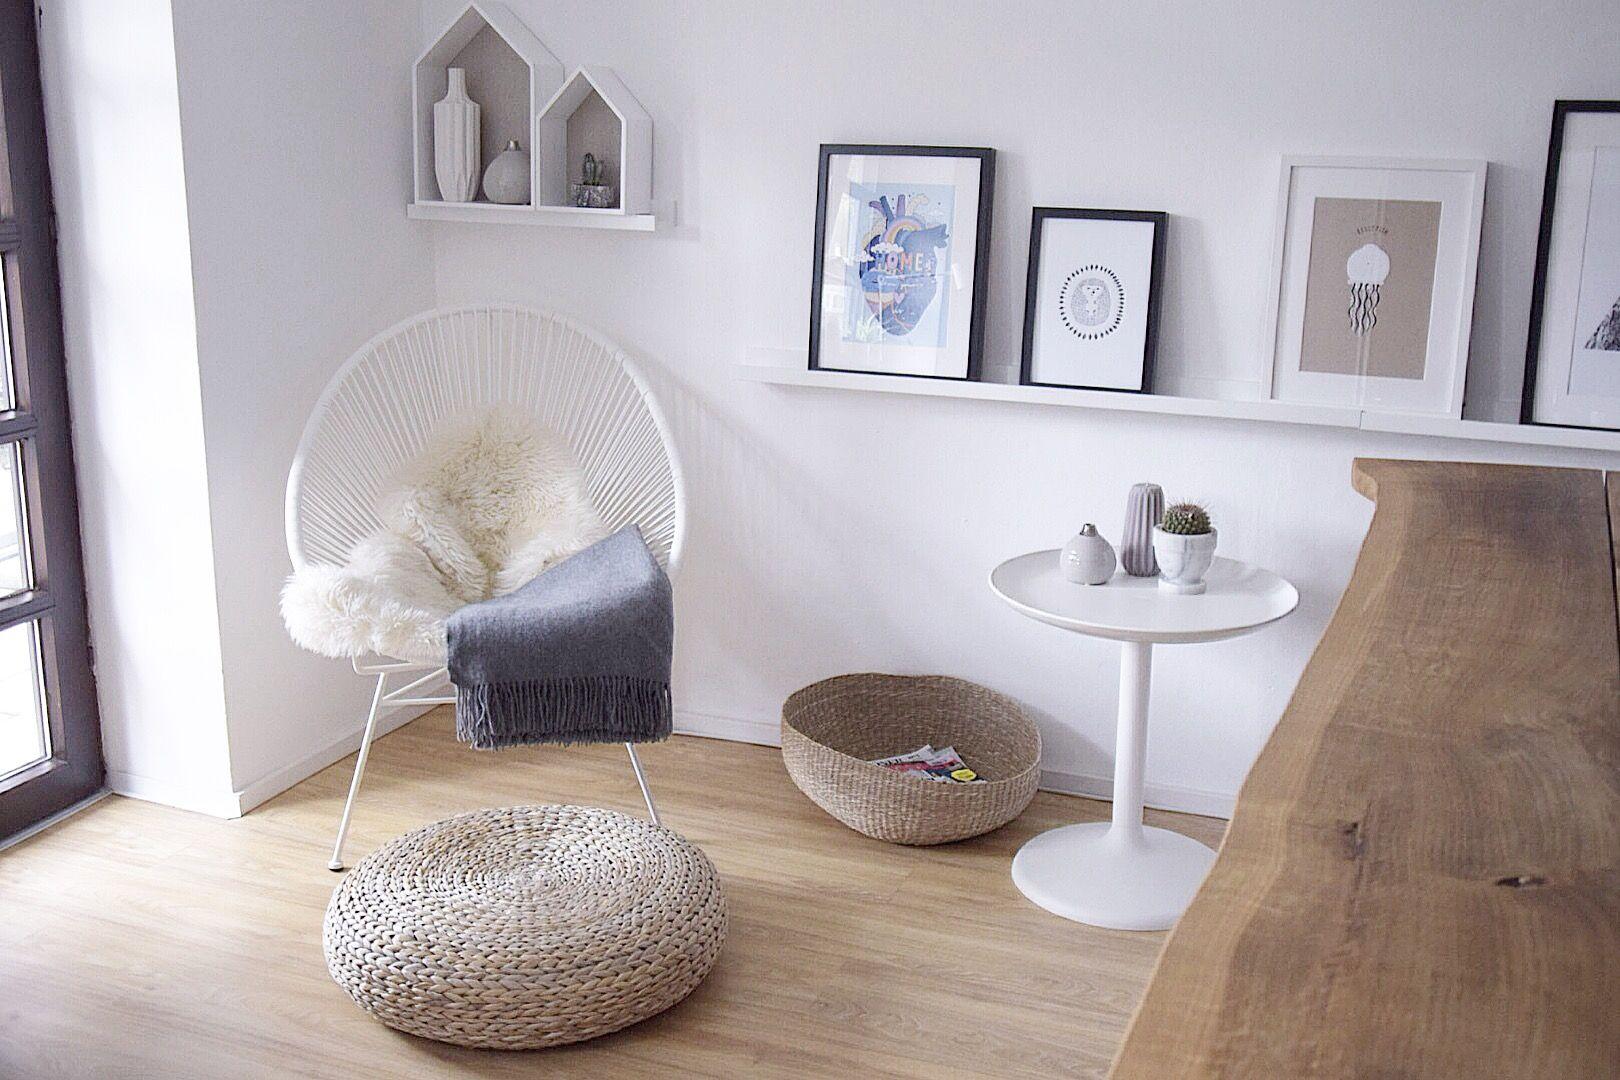 Fecoon Onlineshop Brand Lisa Konig Fine Art Print Home Decor Decor Photo And Video